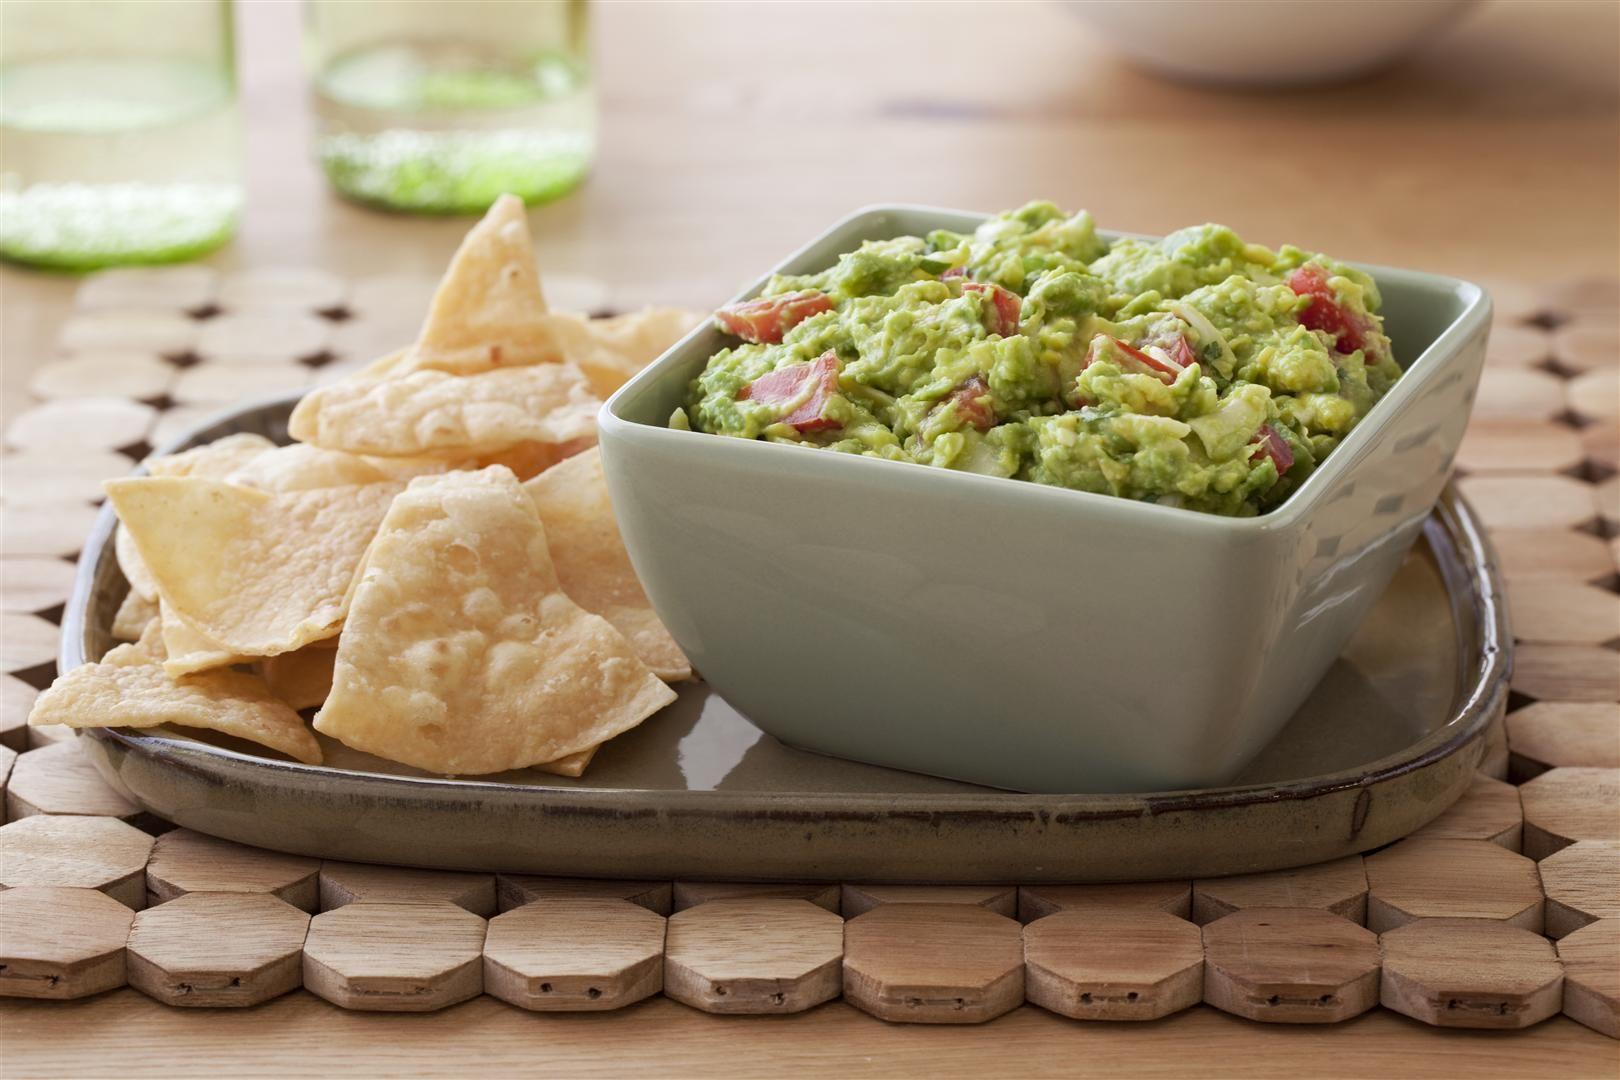 Award Winning Guacamole California Avocados Recipe Award Winning Guacamole Recipe Avocado Recipes Recipes